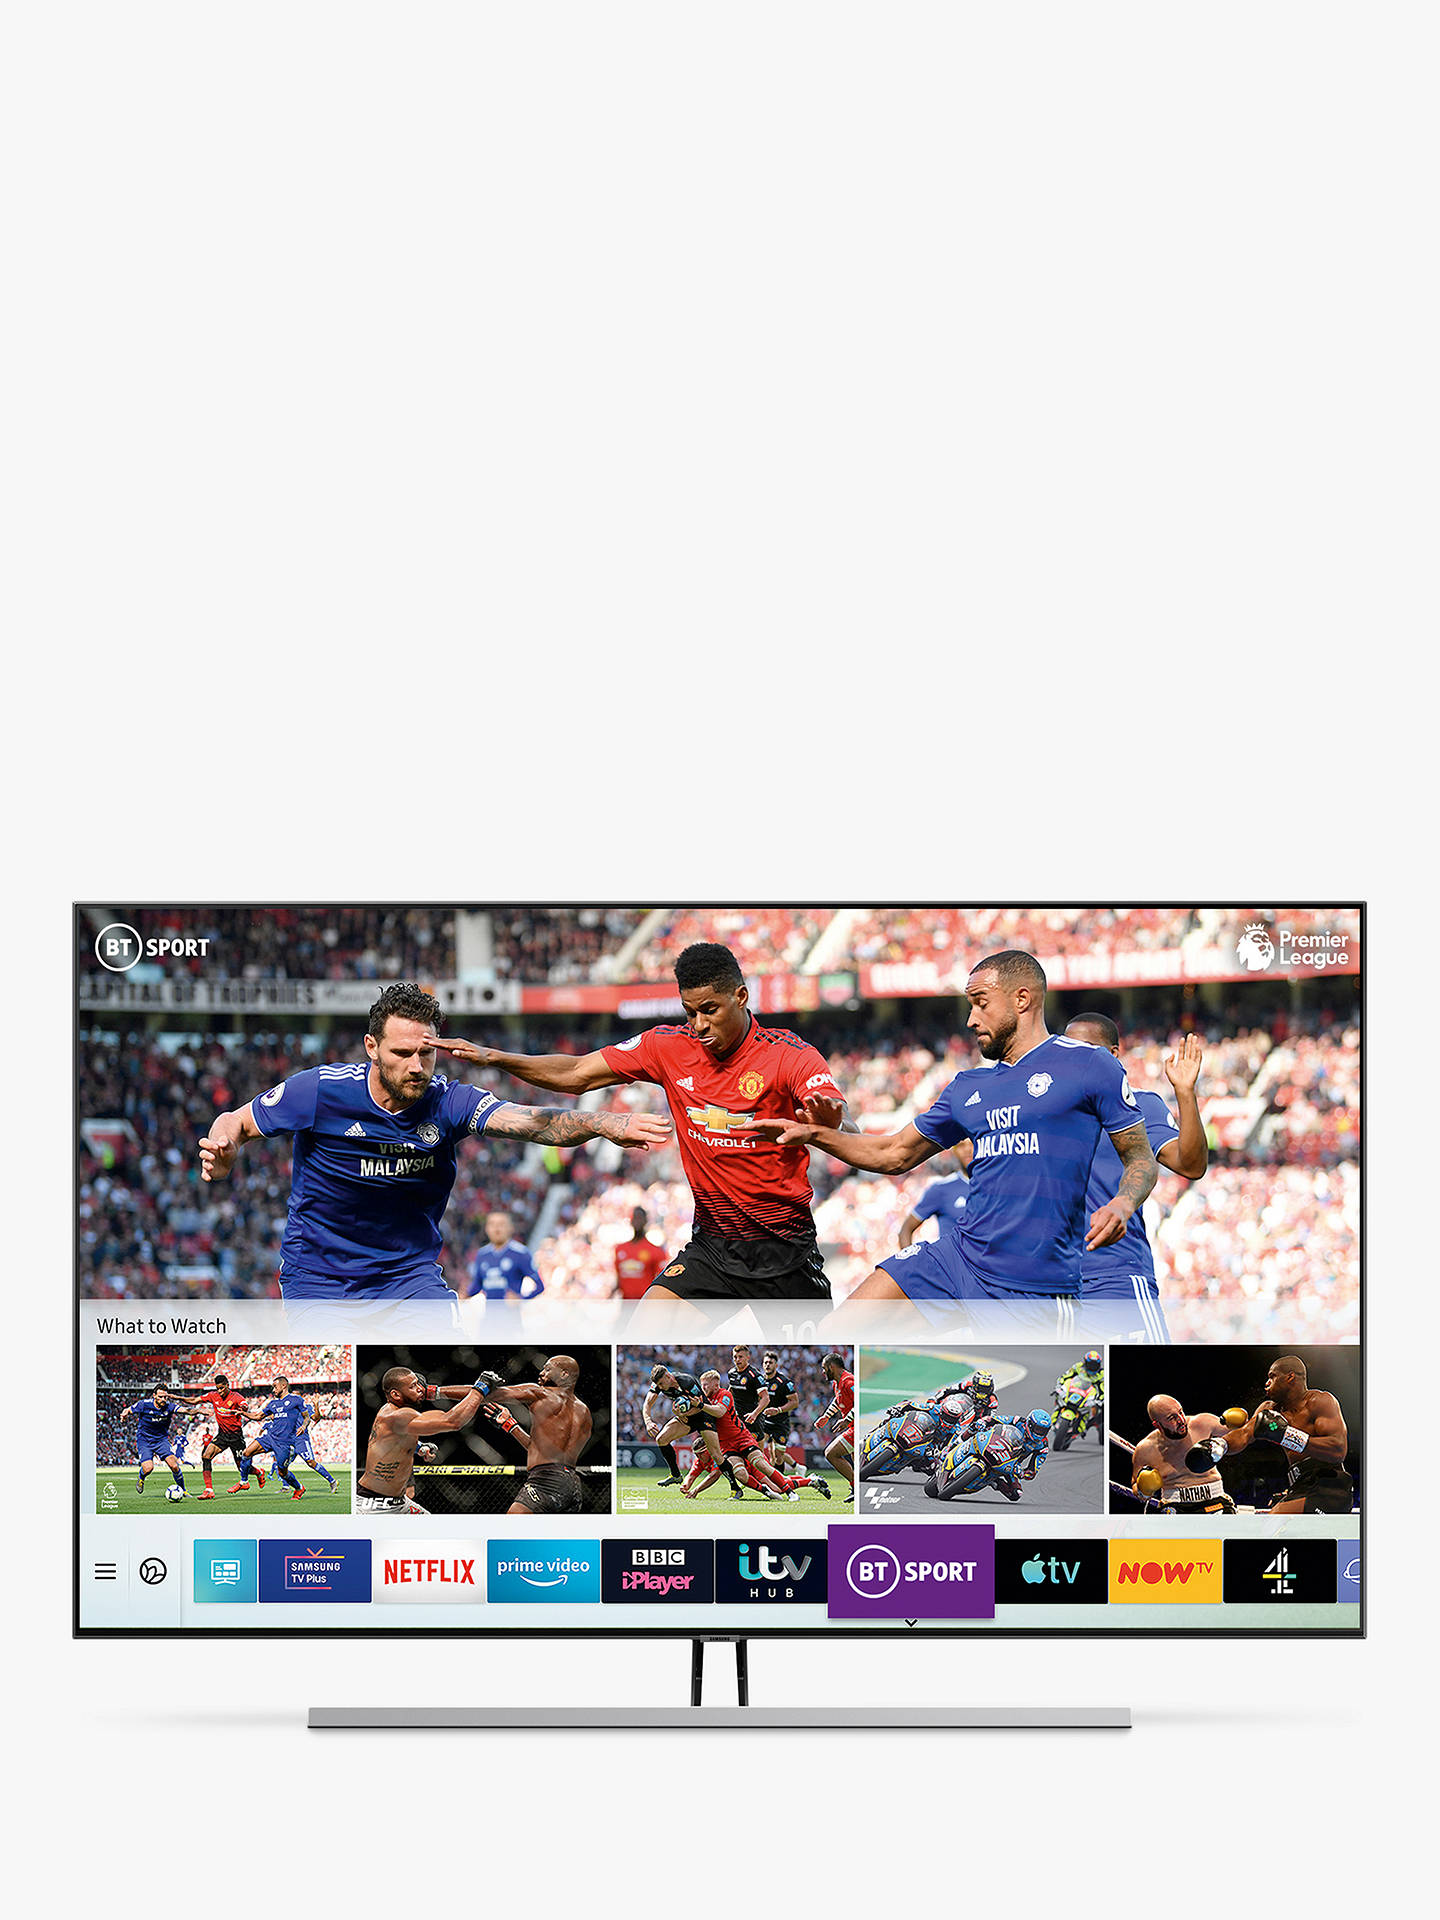 Samsung QE55Q85R (2019) QLED HDR 1500 4K Ultra HD Smart TV, 55